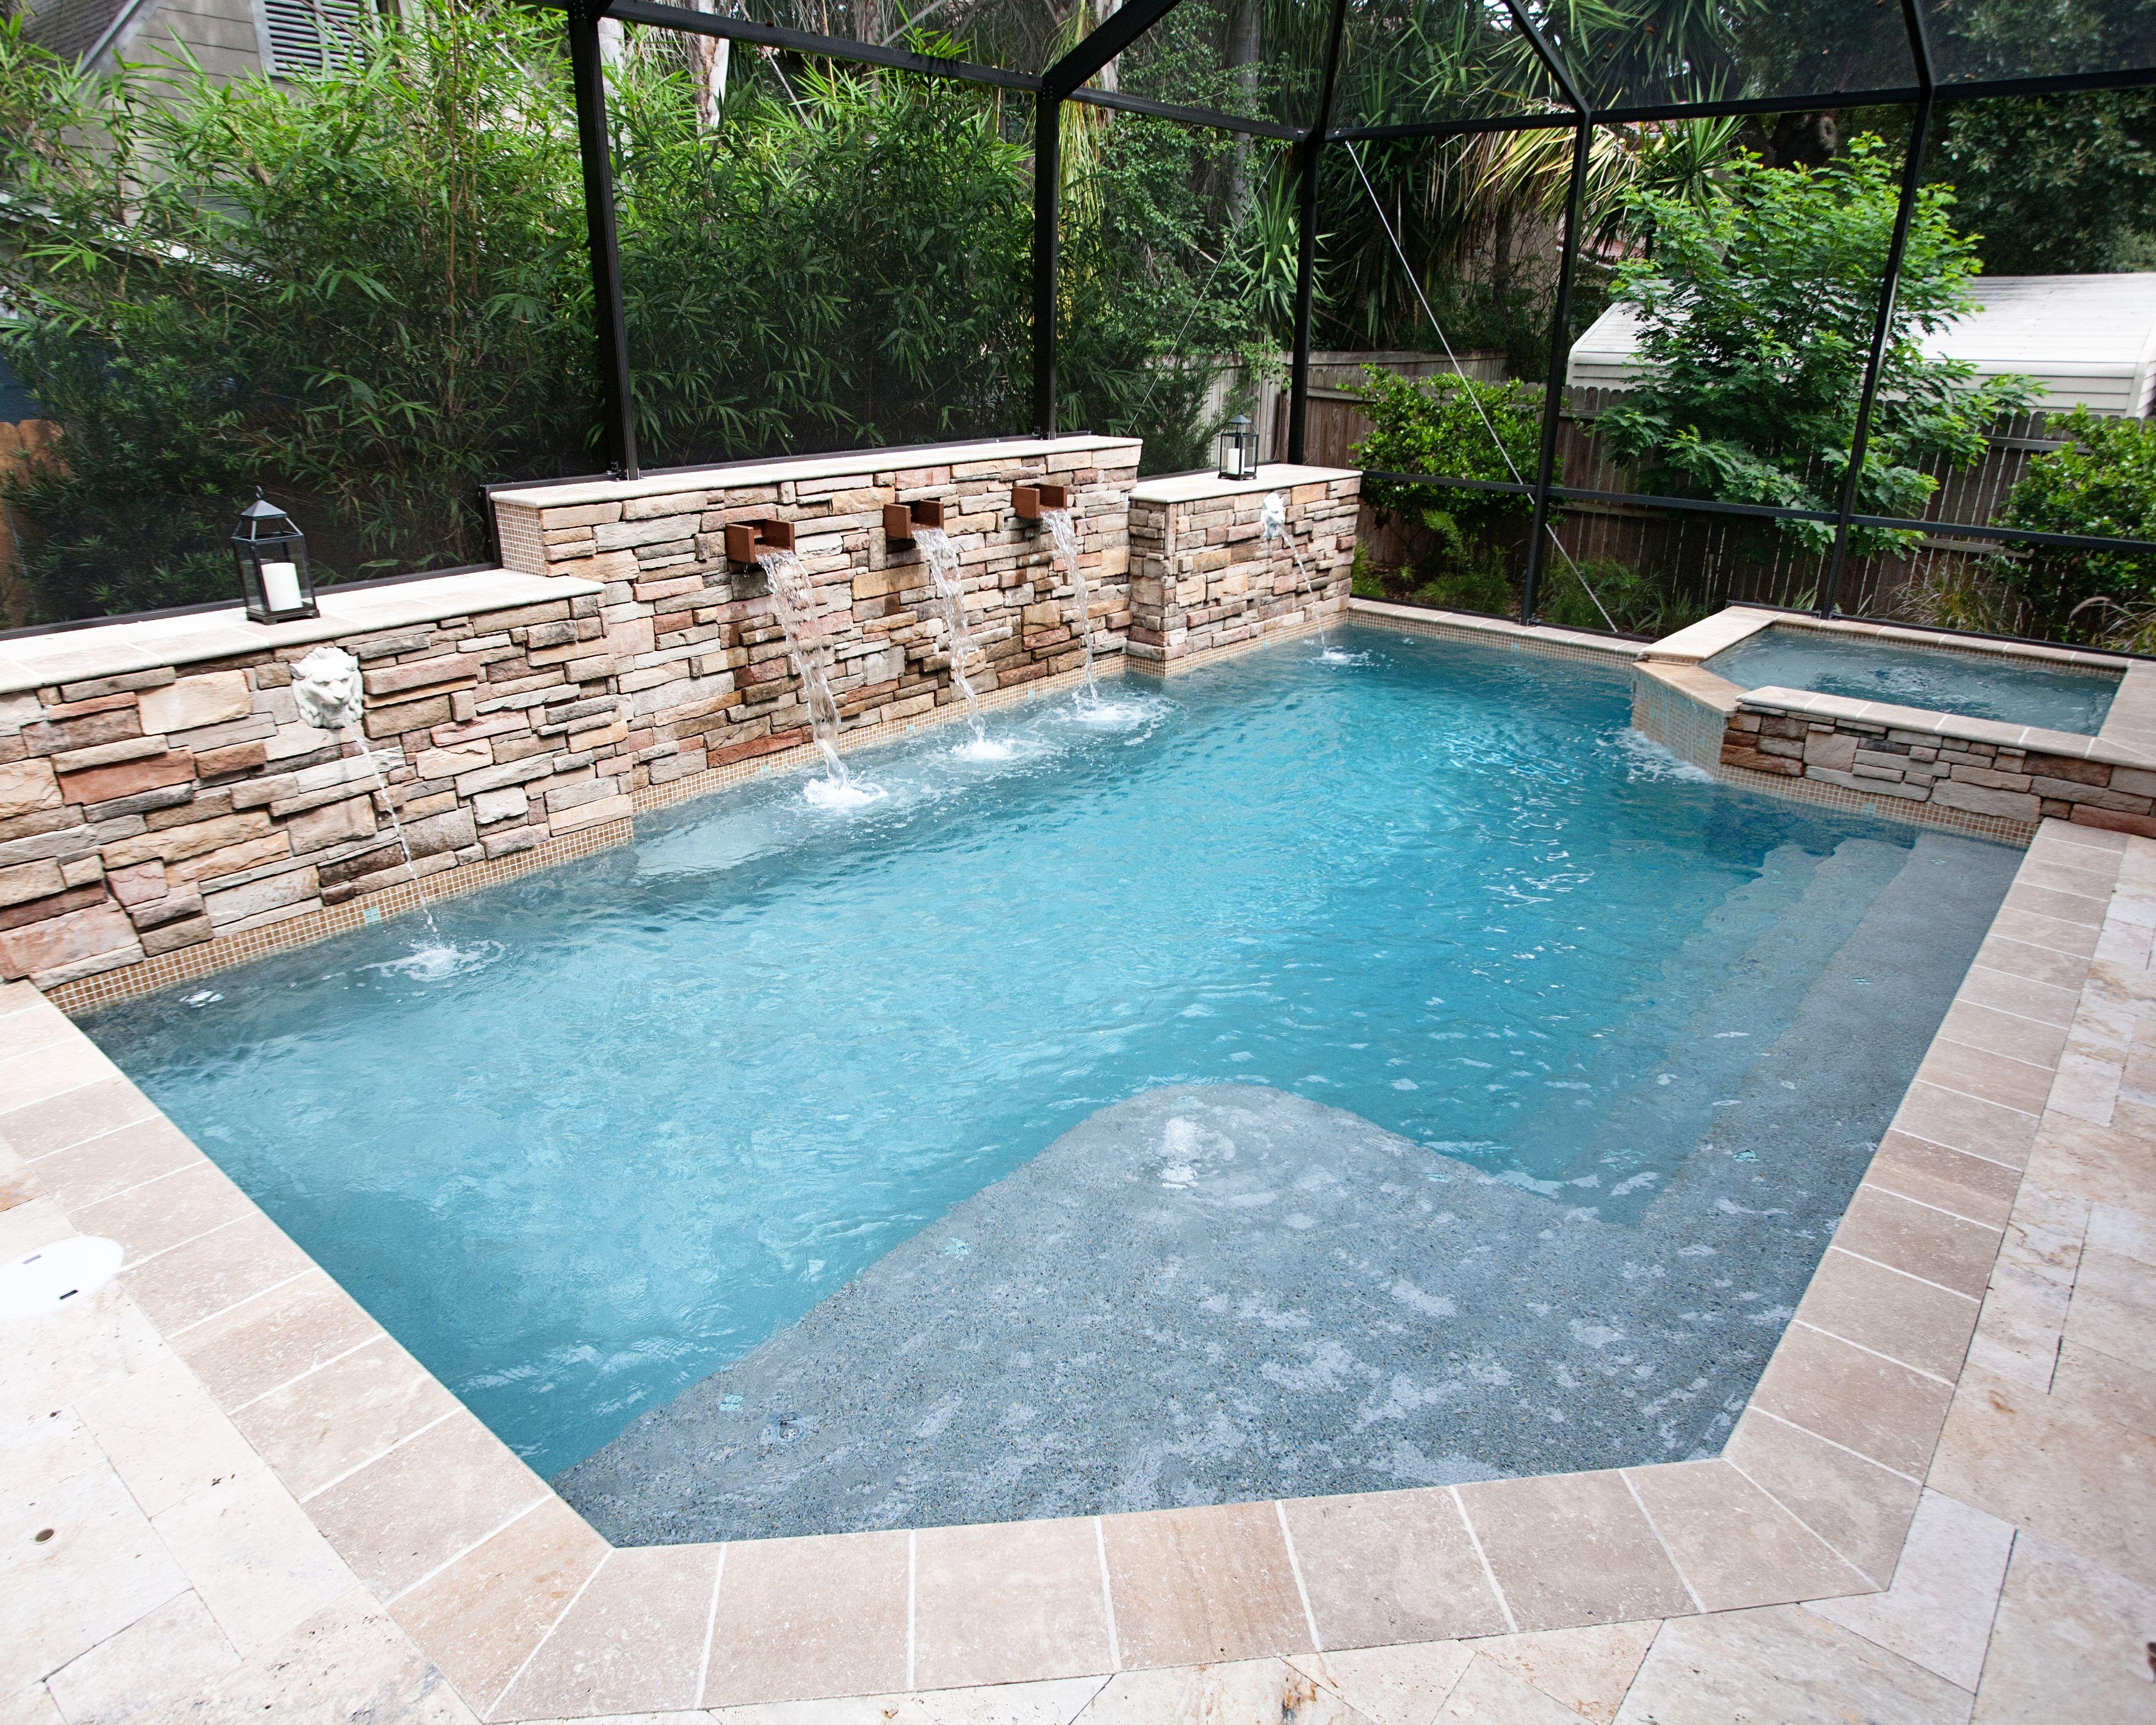 Wonderful Pool Finish Ideas For You To Copy: Pool Resurfacing Tampa